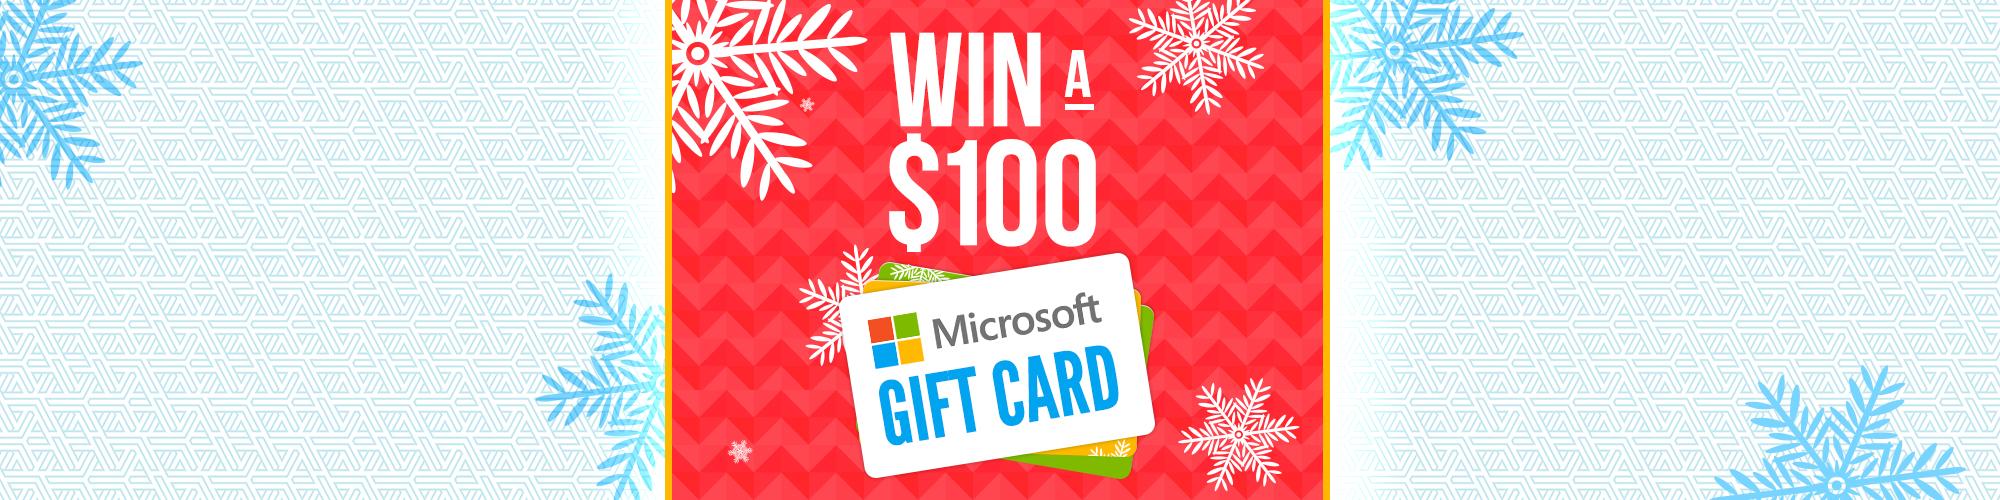 Win a Microsoft Gift Card!